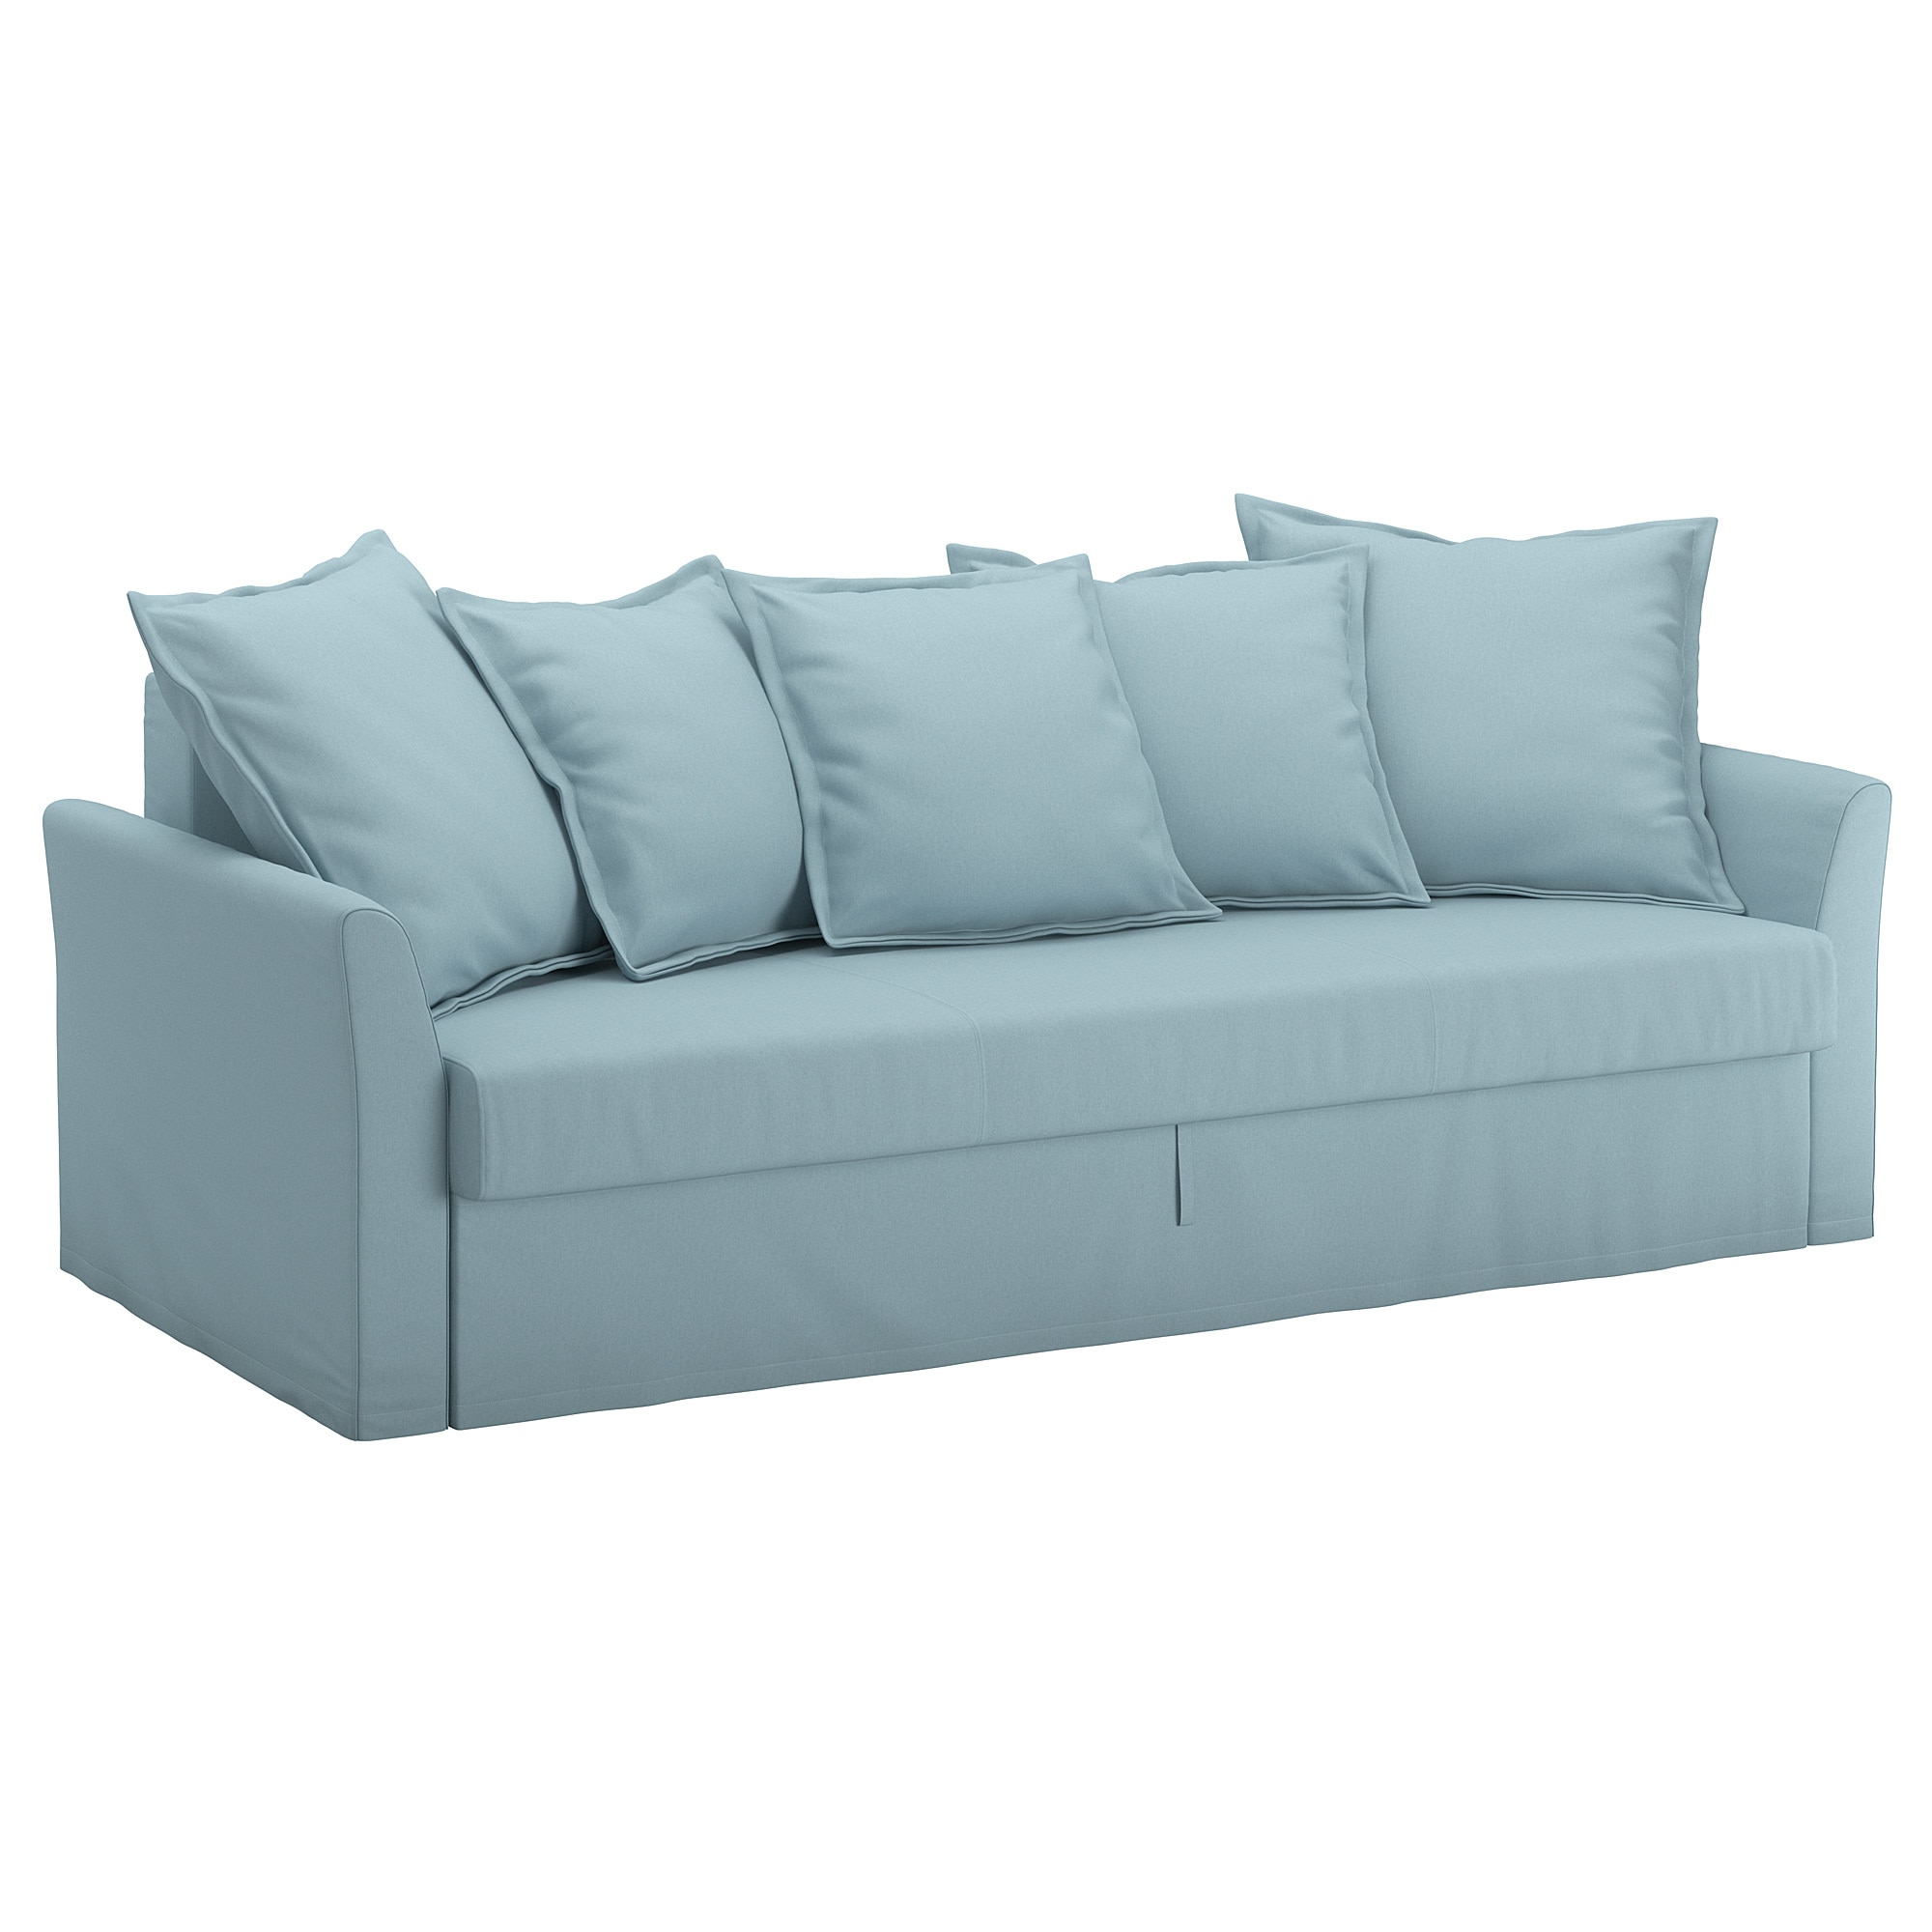 Sofa Cama Apertura Italiana Ikea 9fdy sofà S Cama De Calidad Pra Online Ikea